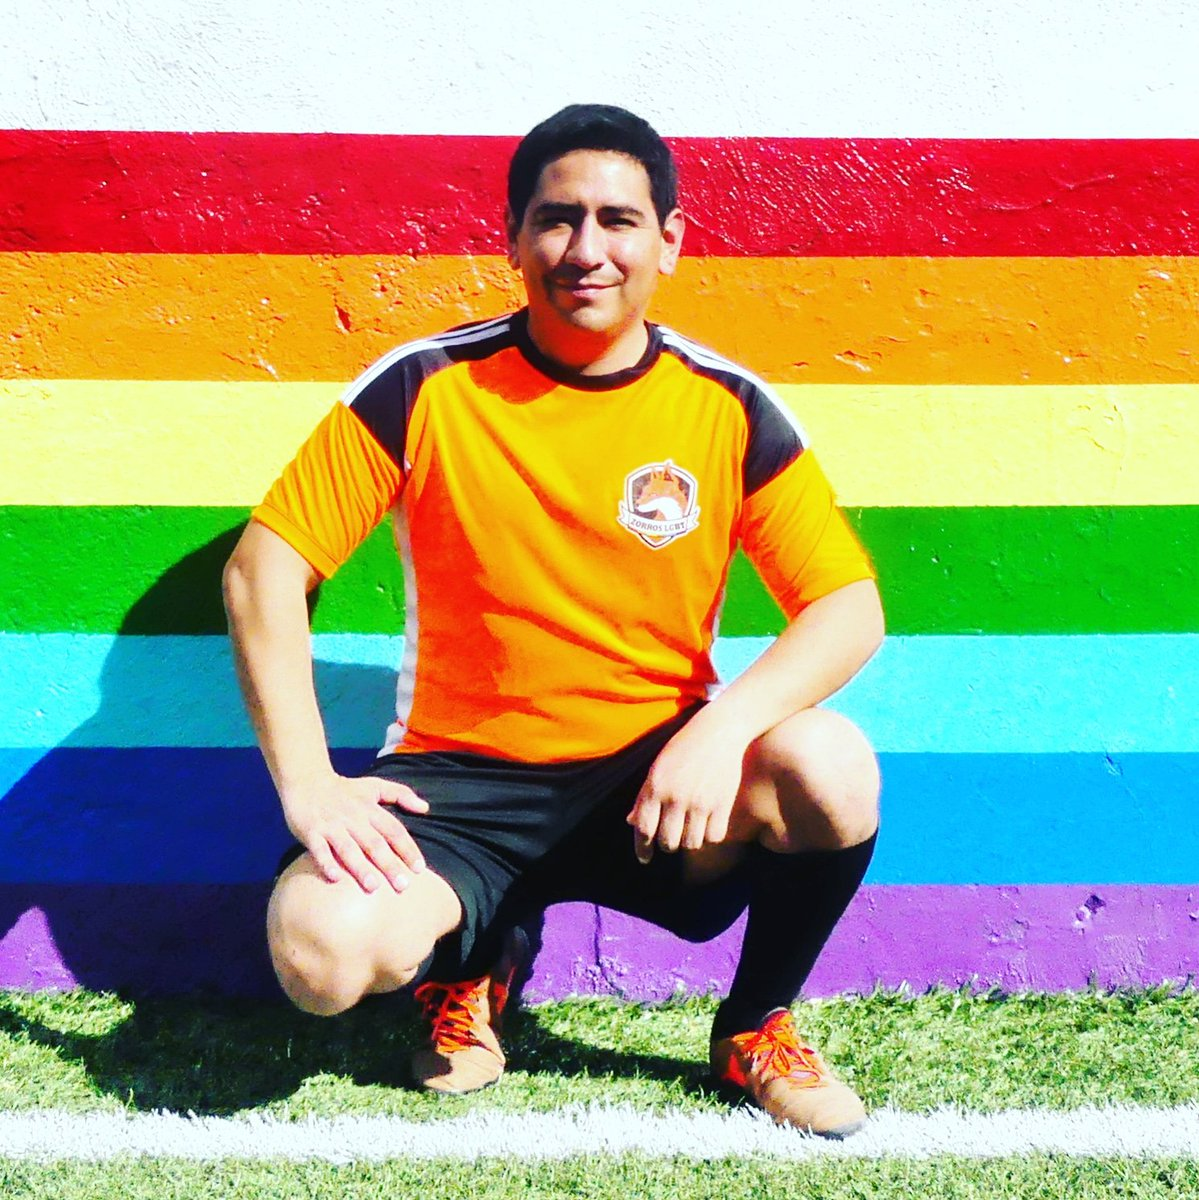 Xavi  Posición: Medio  Equipo: Atlético Zorros  #DeporteLGBT #LGBTSports #FutbolLGBT #ZorrosLGBT #OrgulloDeportivo #instagay #gaysports #gayfutbol #gayboy #futbolgaypic.twitter.com/hMCg1hrM3T